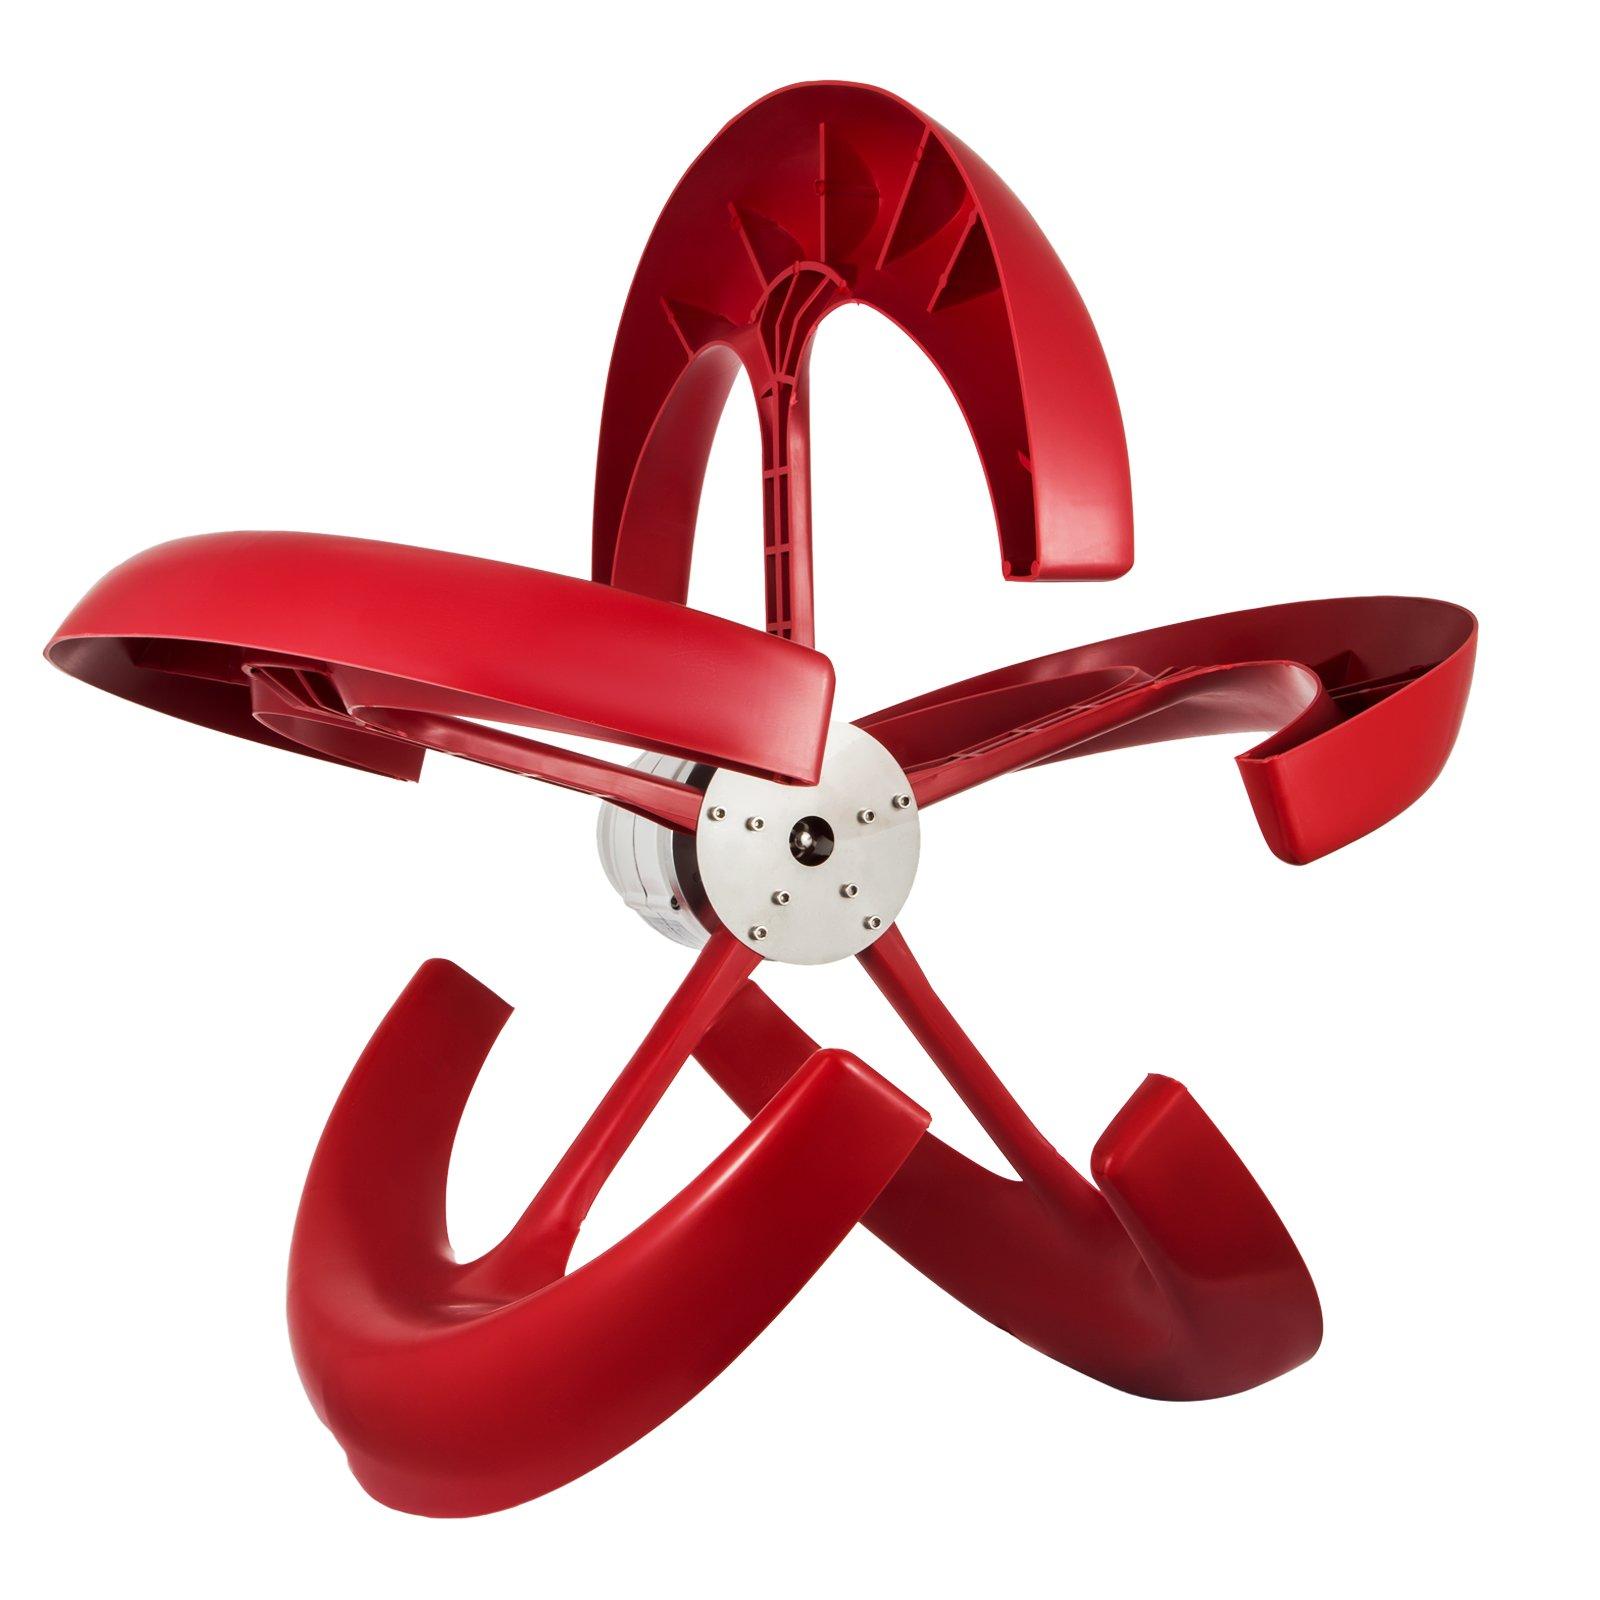 Happybuy Wind Turbine 300W 12V Wind Turbine Generator Red Lantern Vertical Wind Generator 5 Leaves Wind Turbine Kit with Controller No Pole (300W 12V, Red) by Happybuy (Image #4)